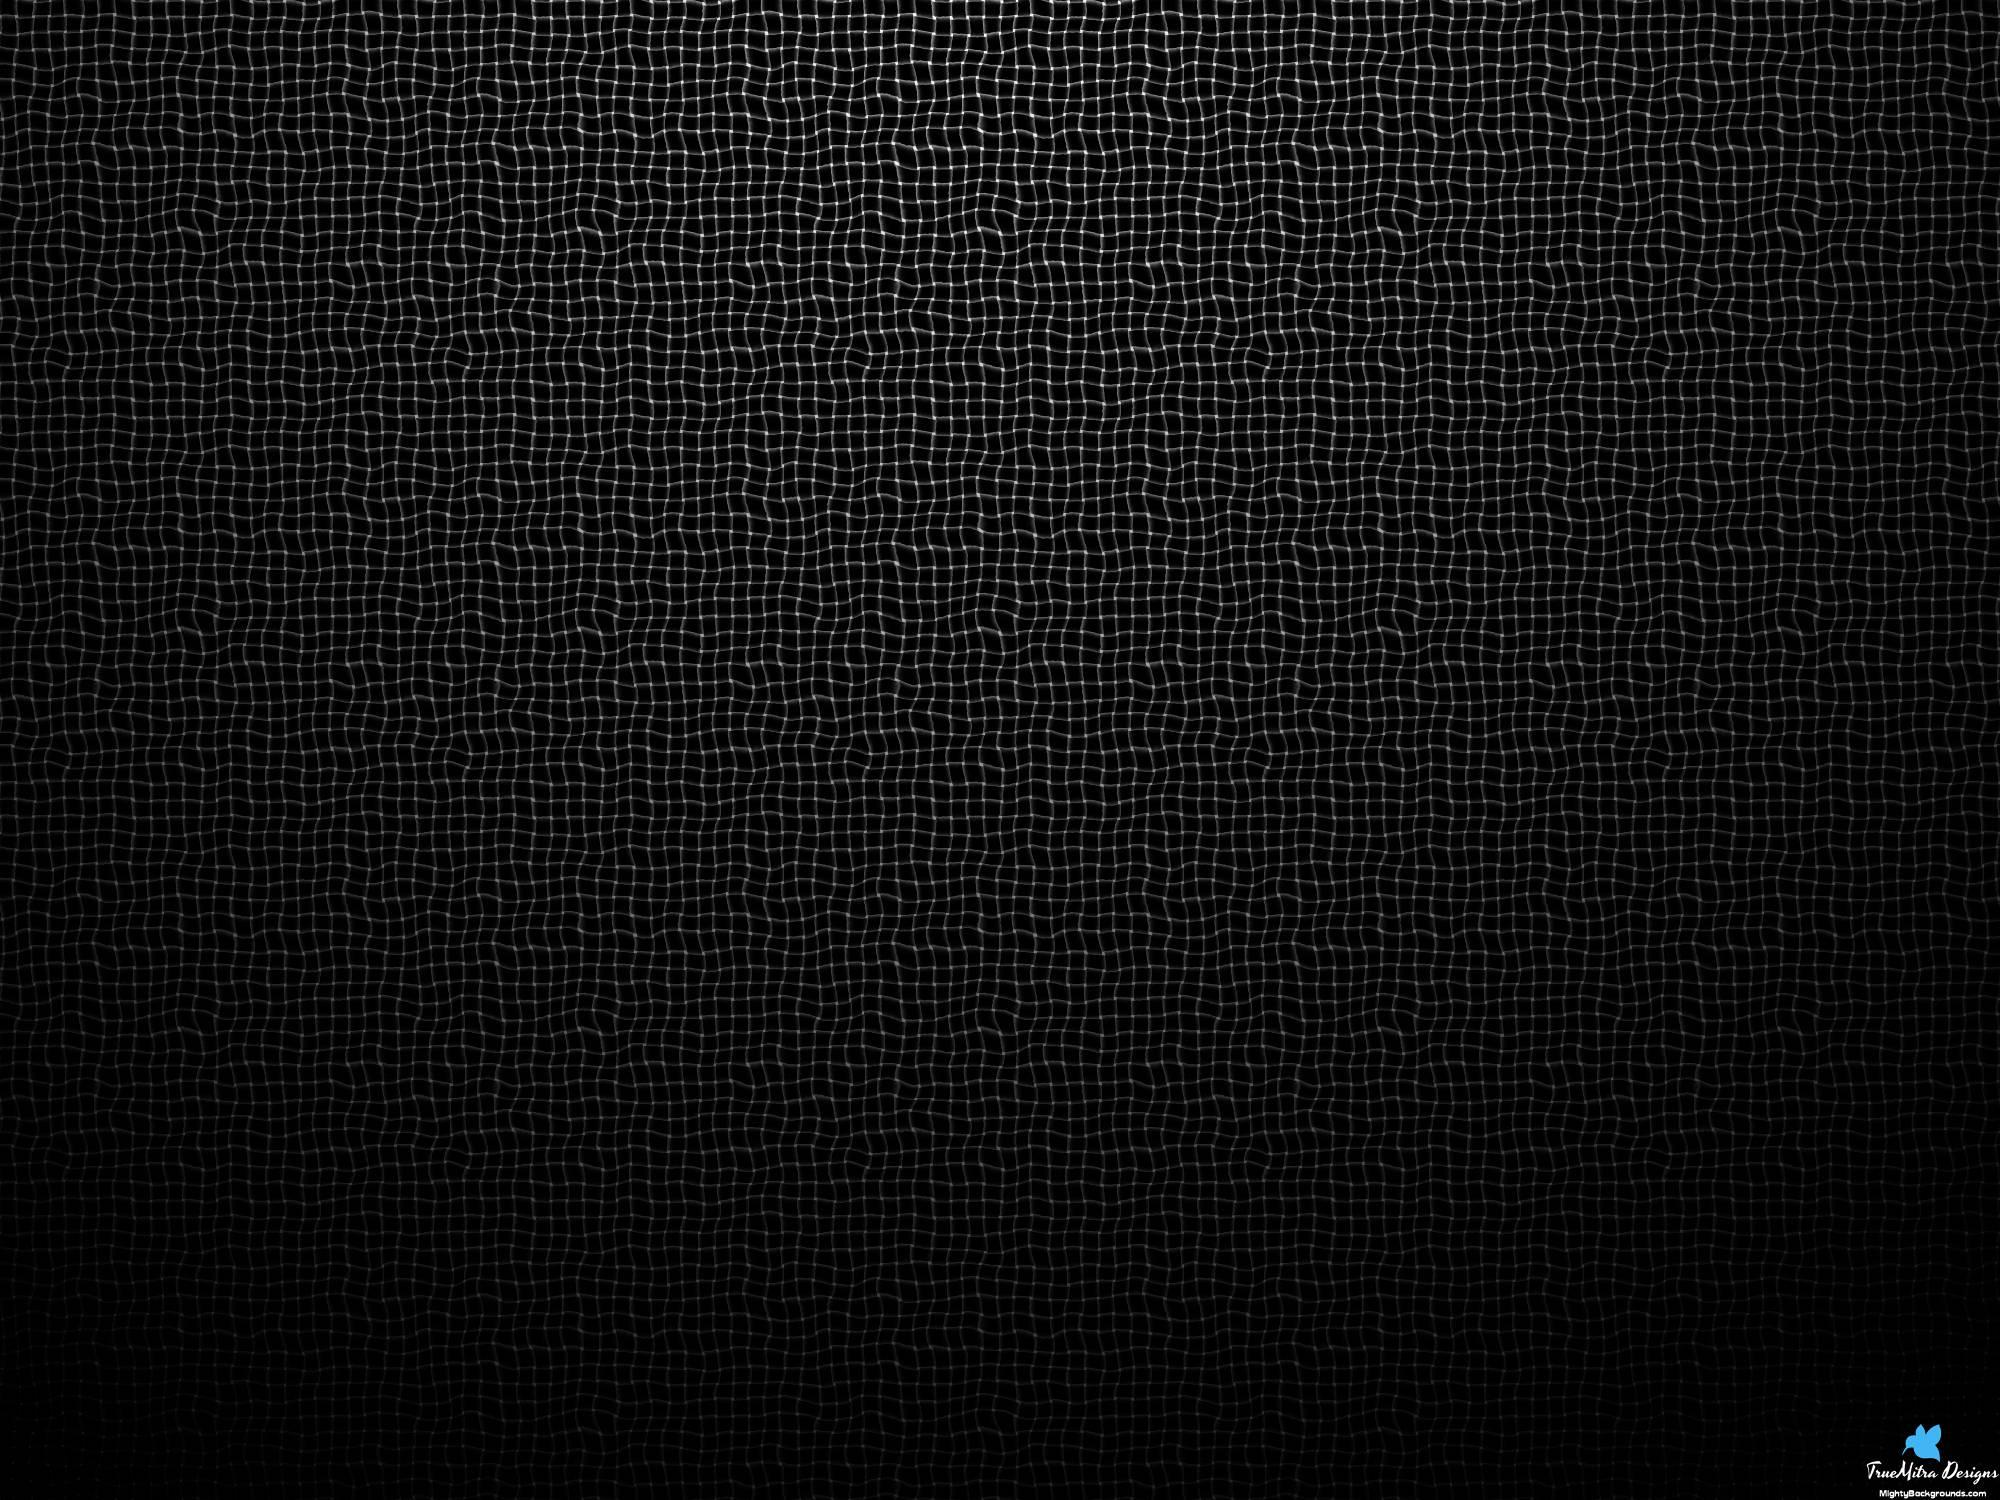 Background image xhtml - Under Armour Background